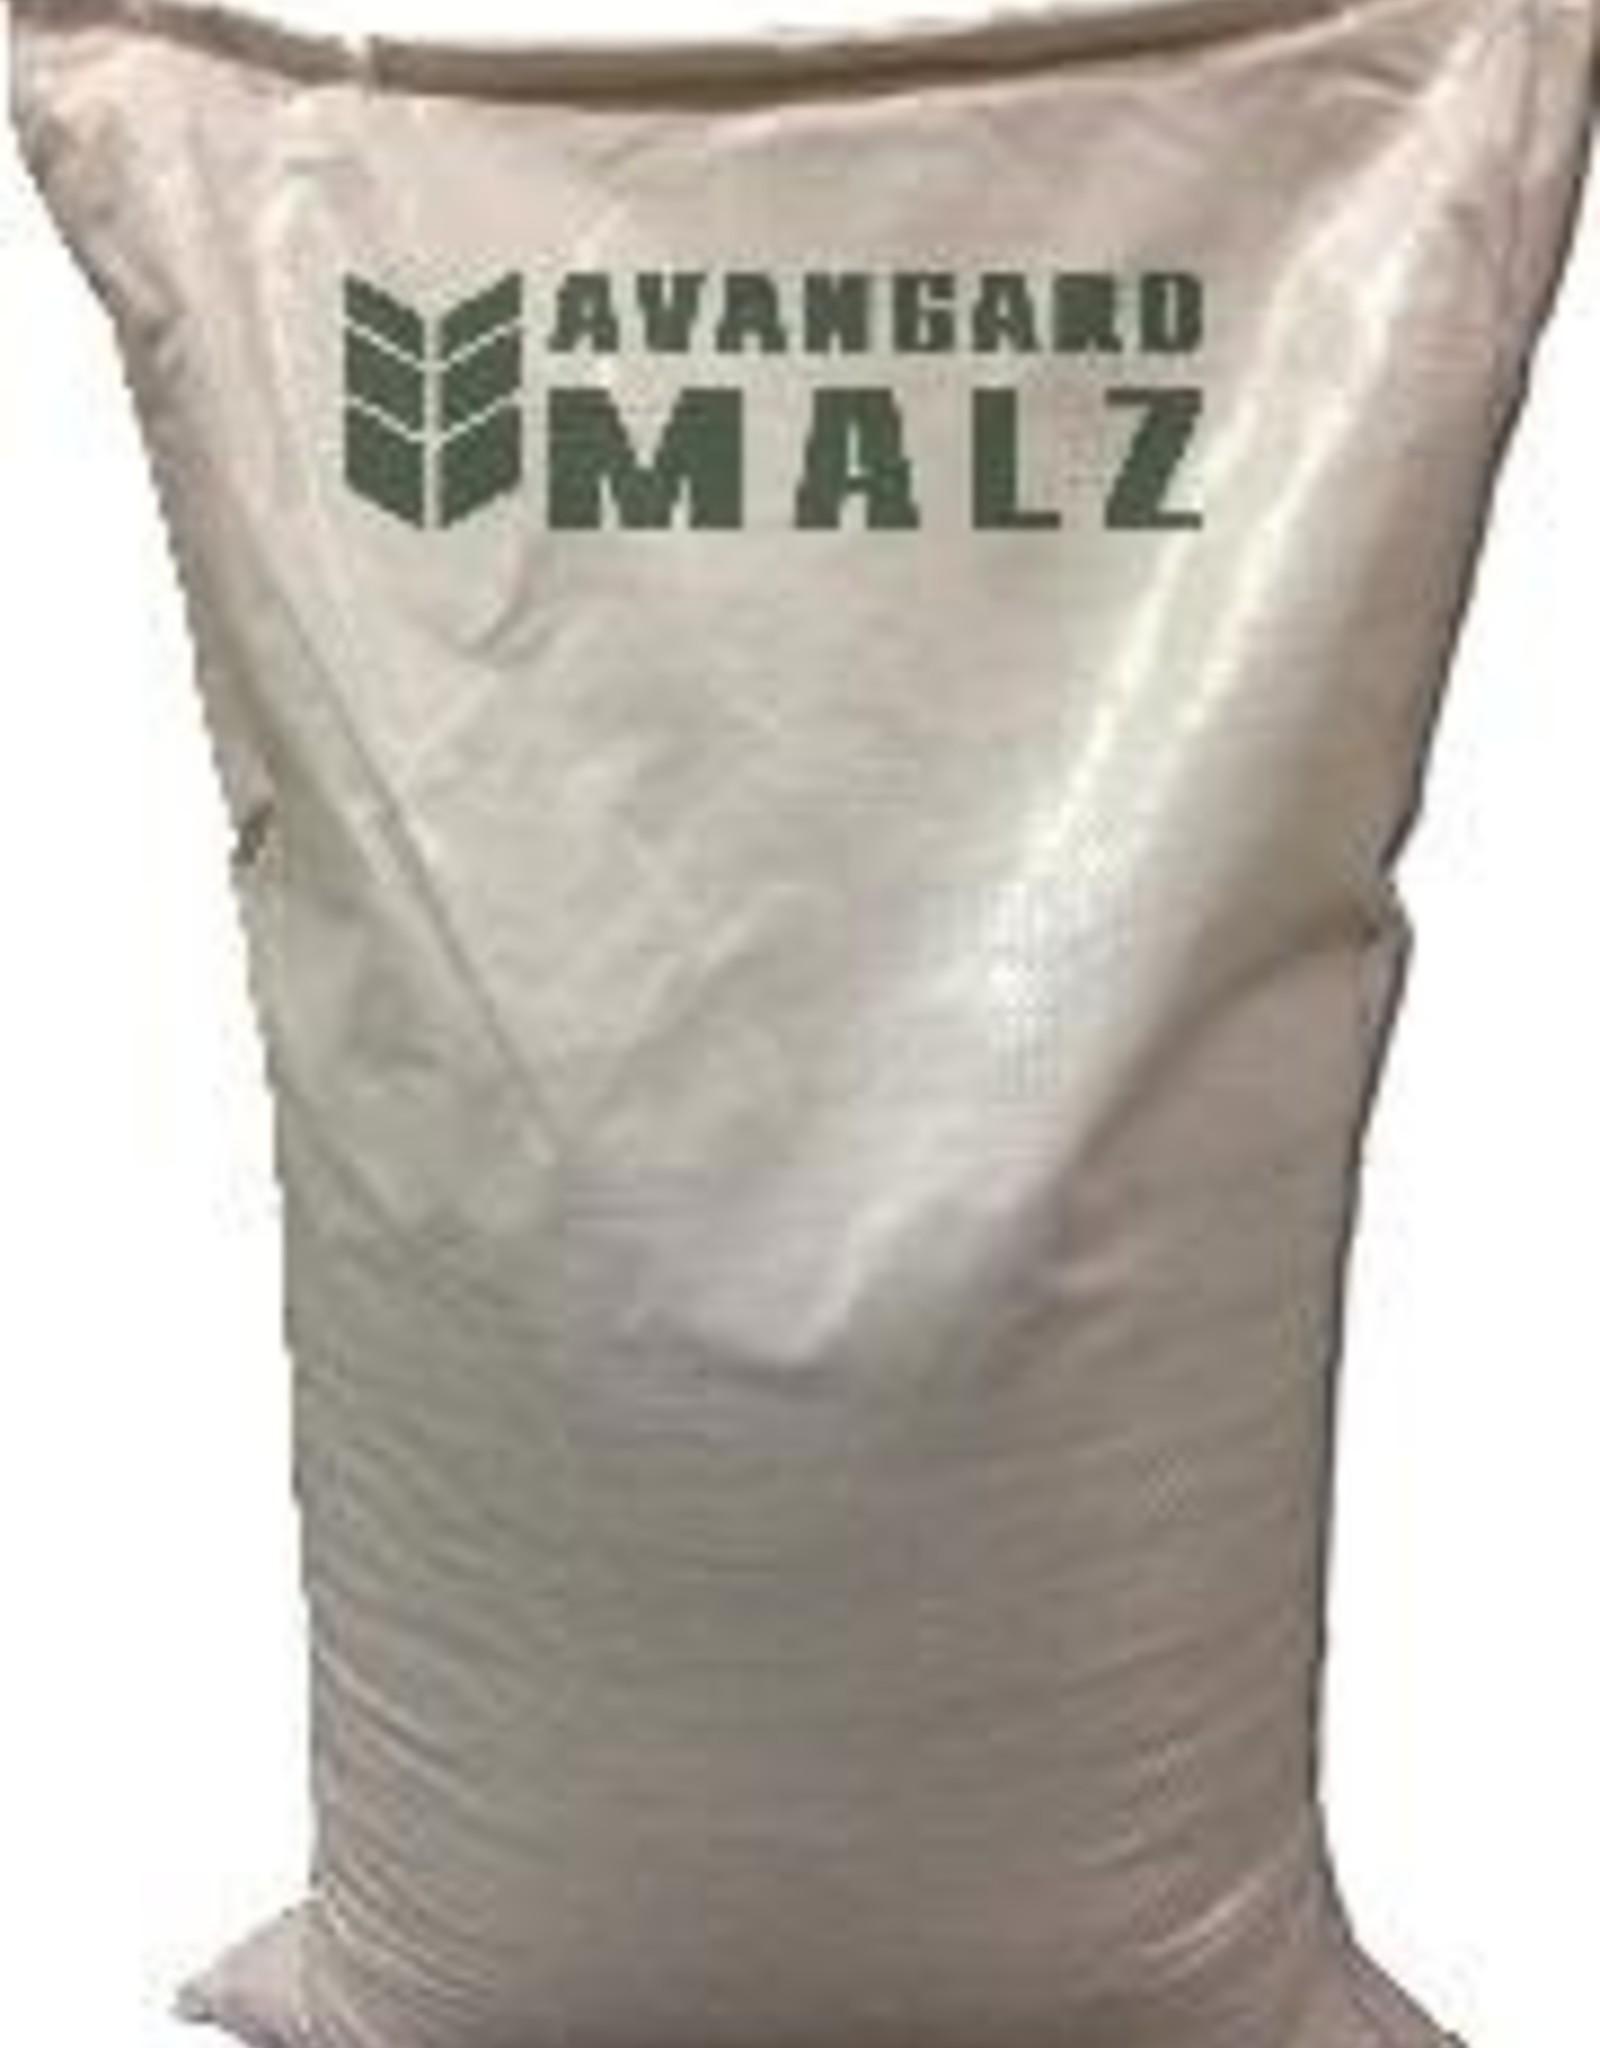 AVANGARD Base malt for a wide variety of beers